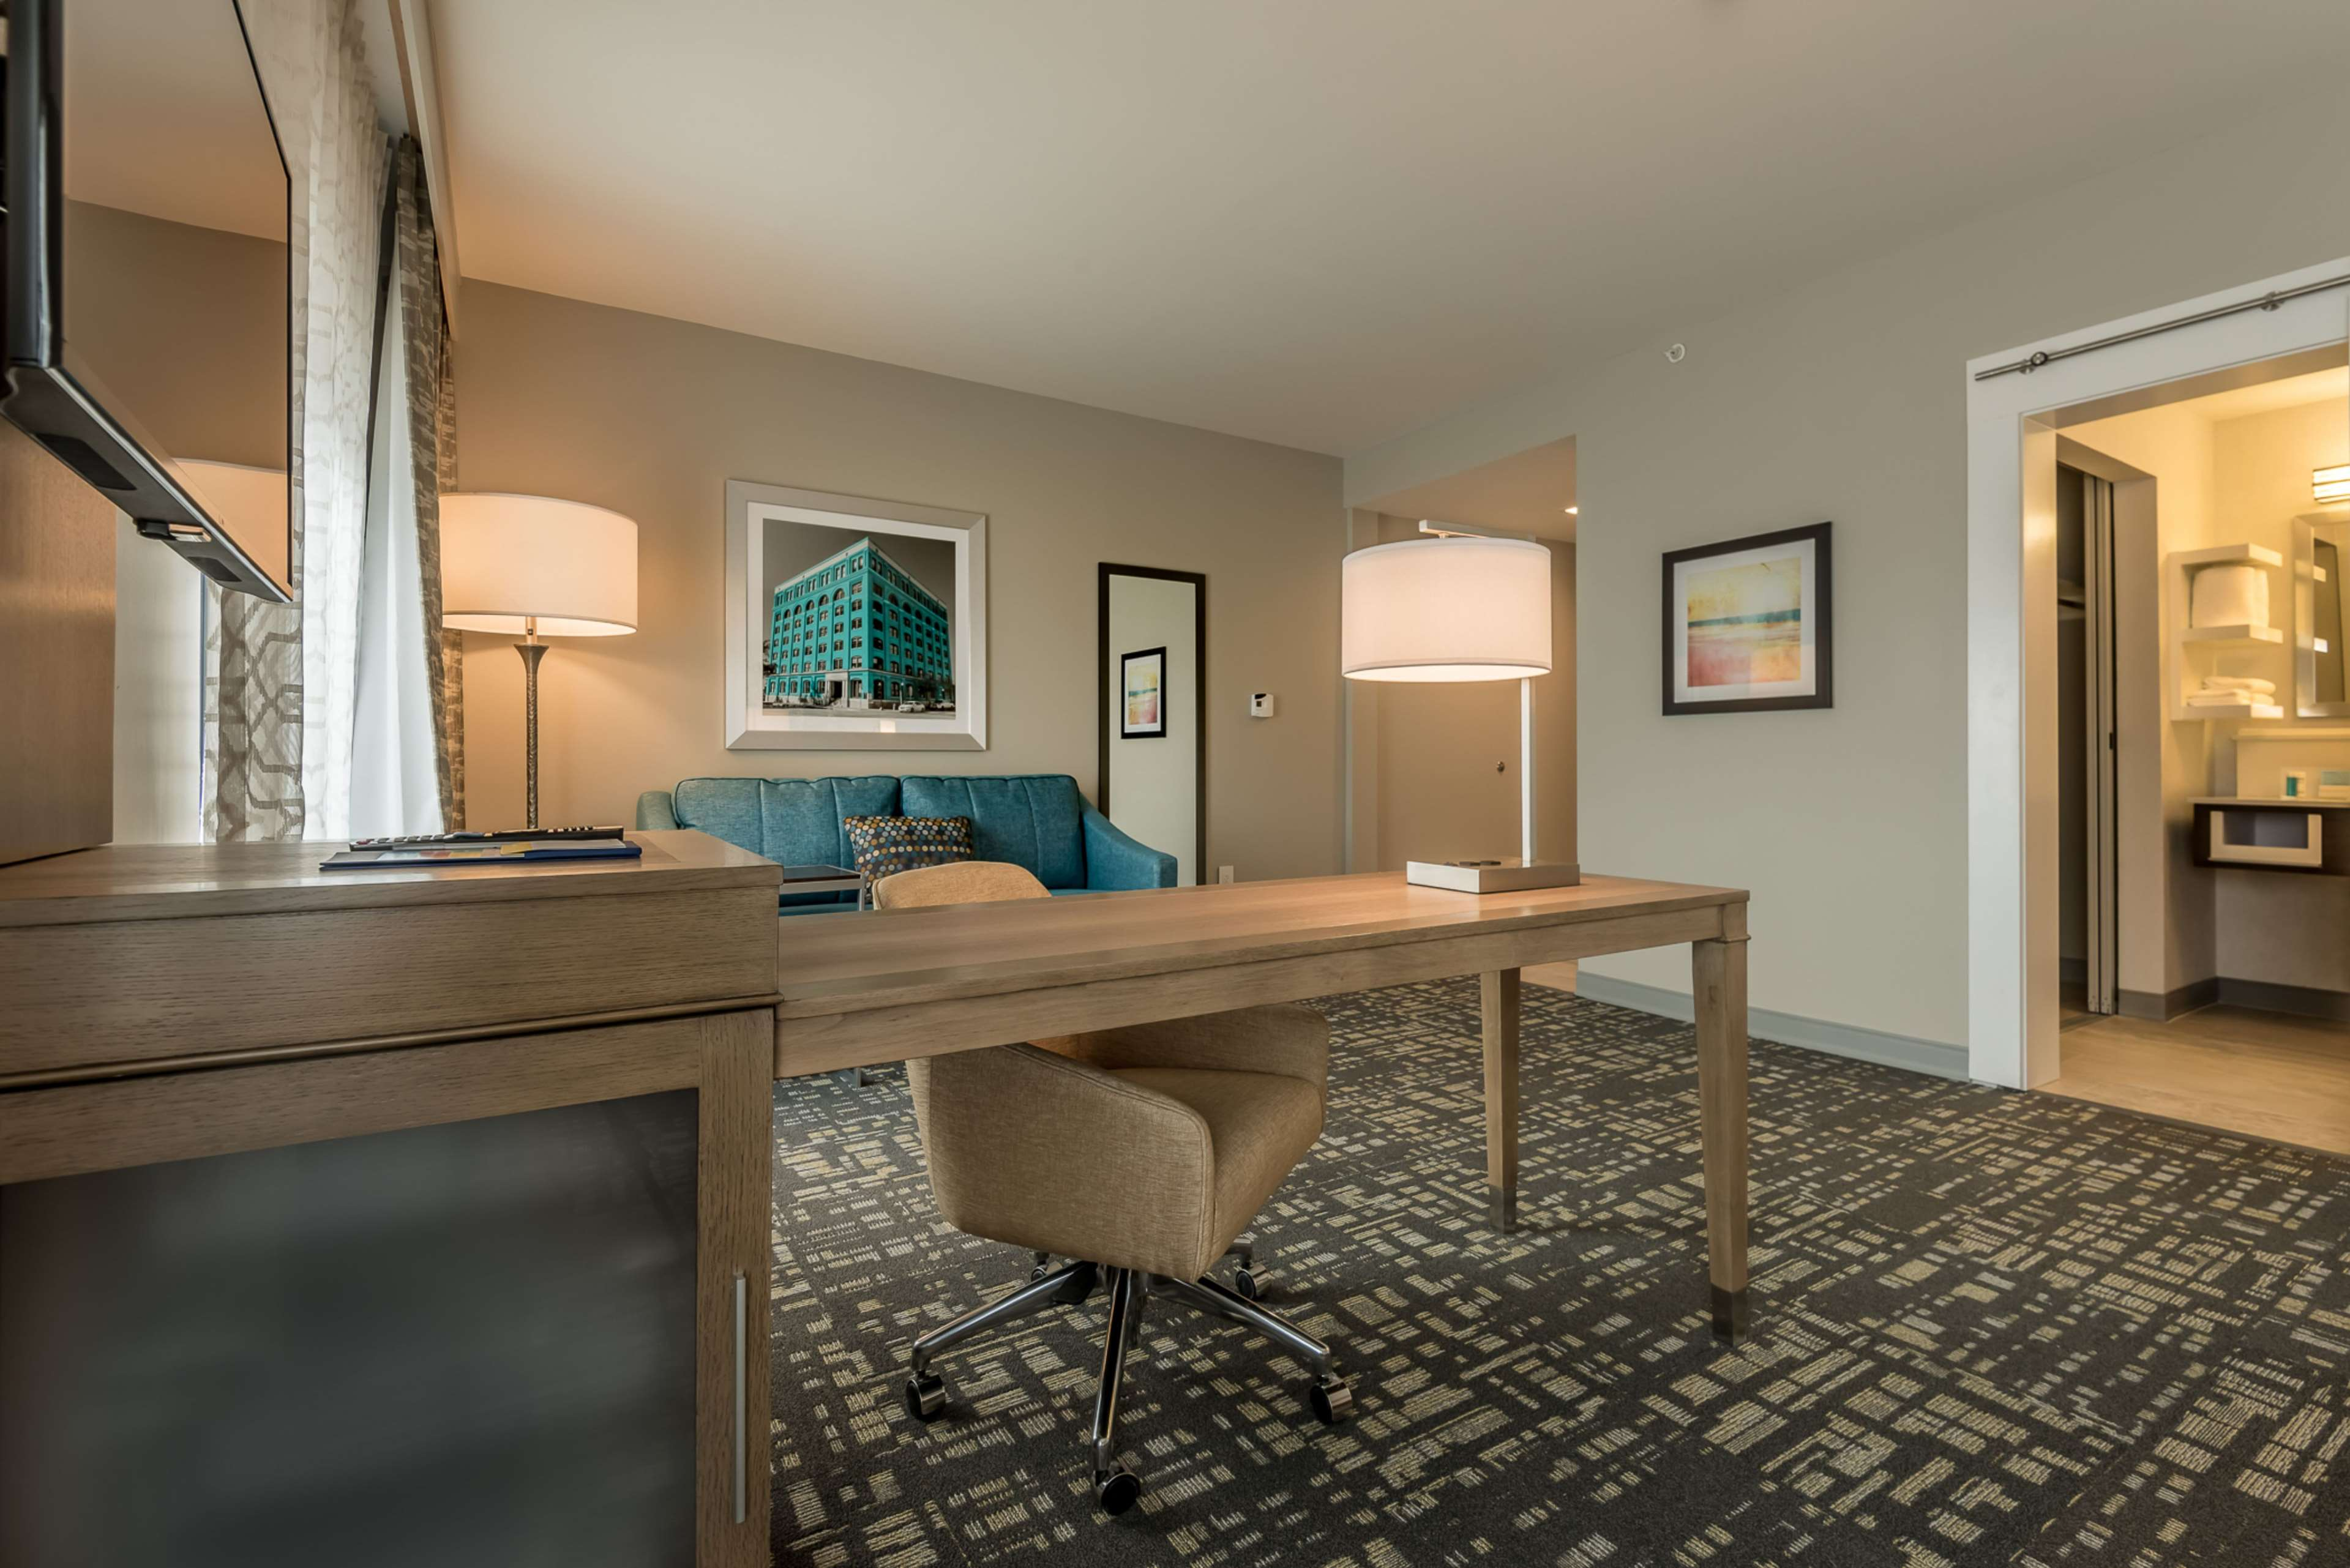 Hampton Inn & Suites Dallas-The Colony, TX image 23